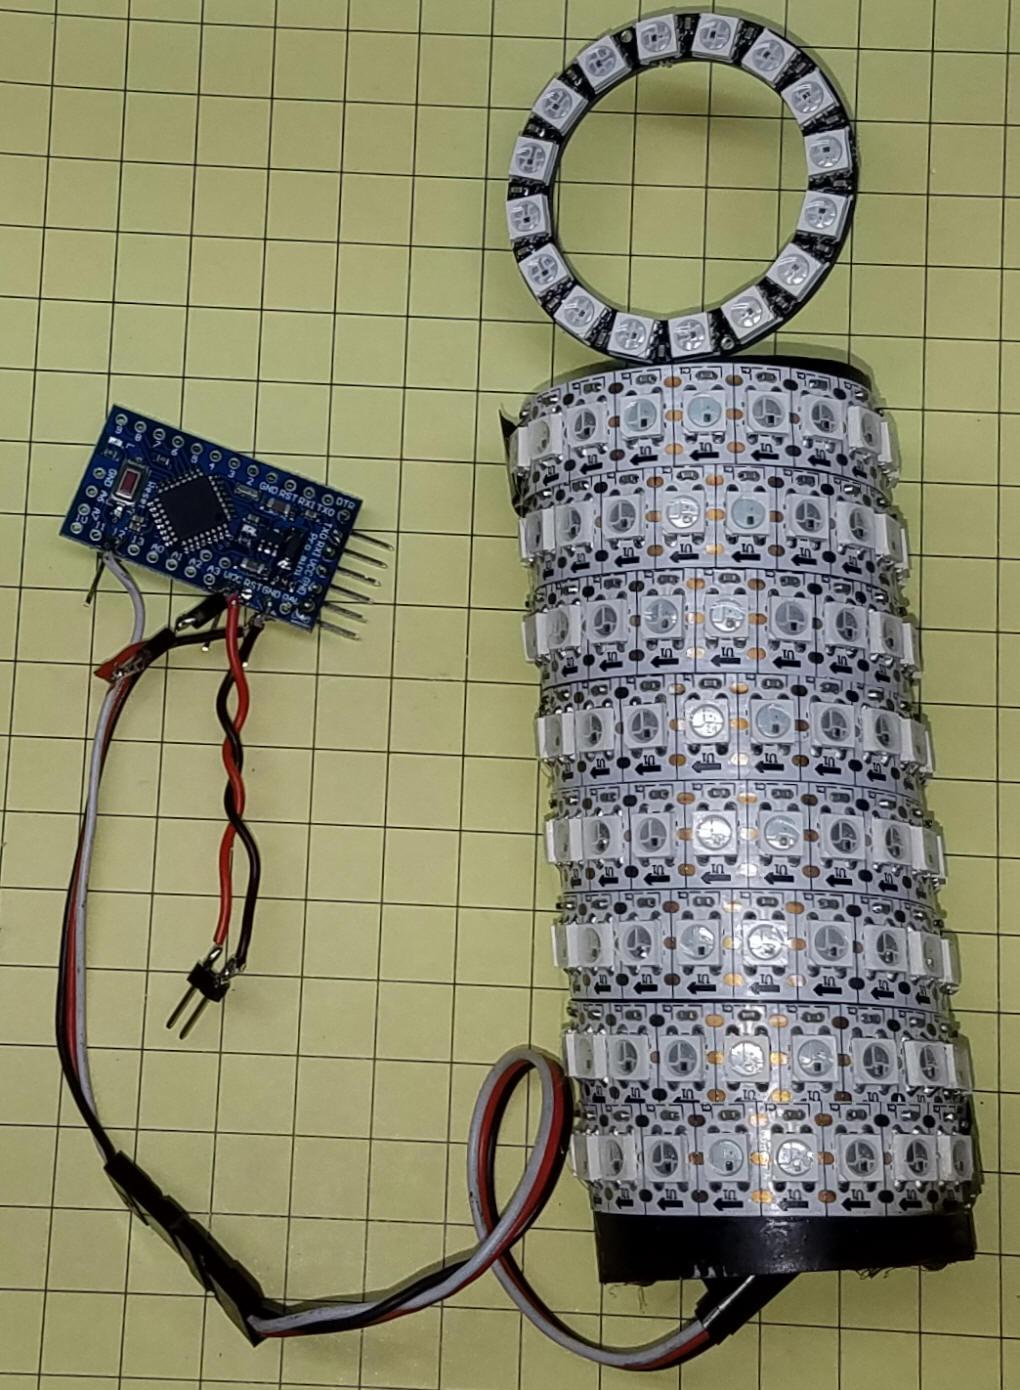 160 LEDs Chasing Round & Round